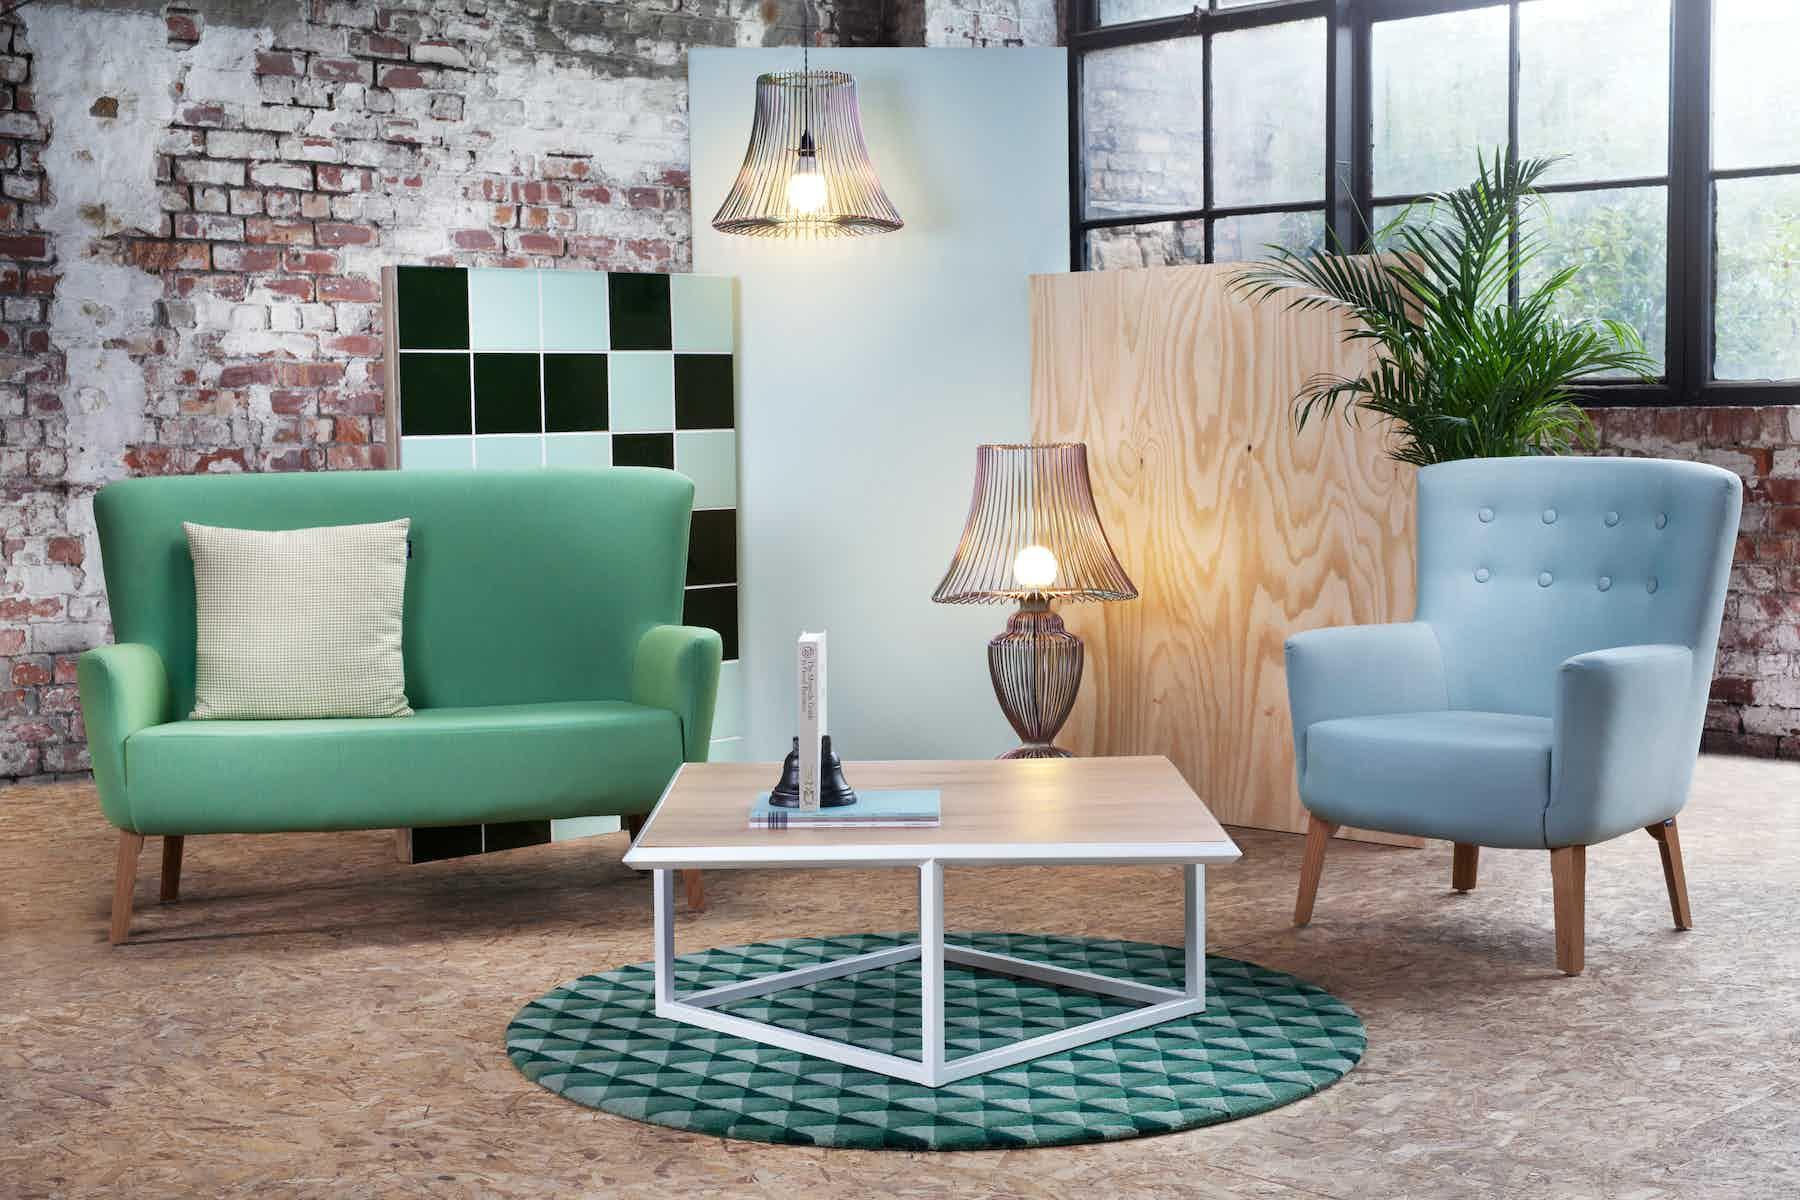 Deadgood-knurled-rug-living-room-green-haute-living